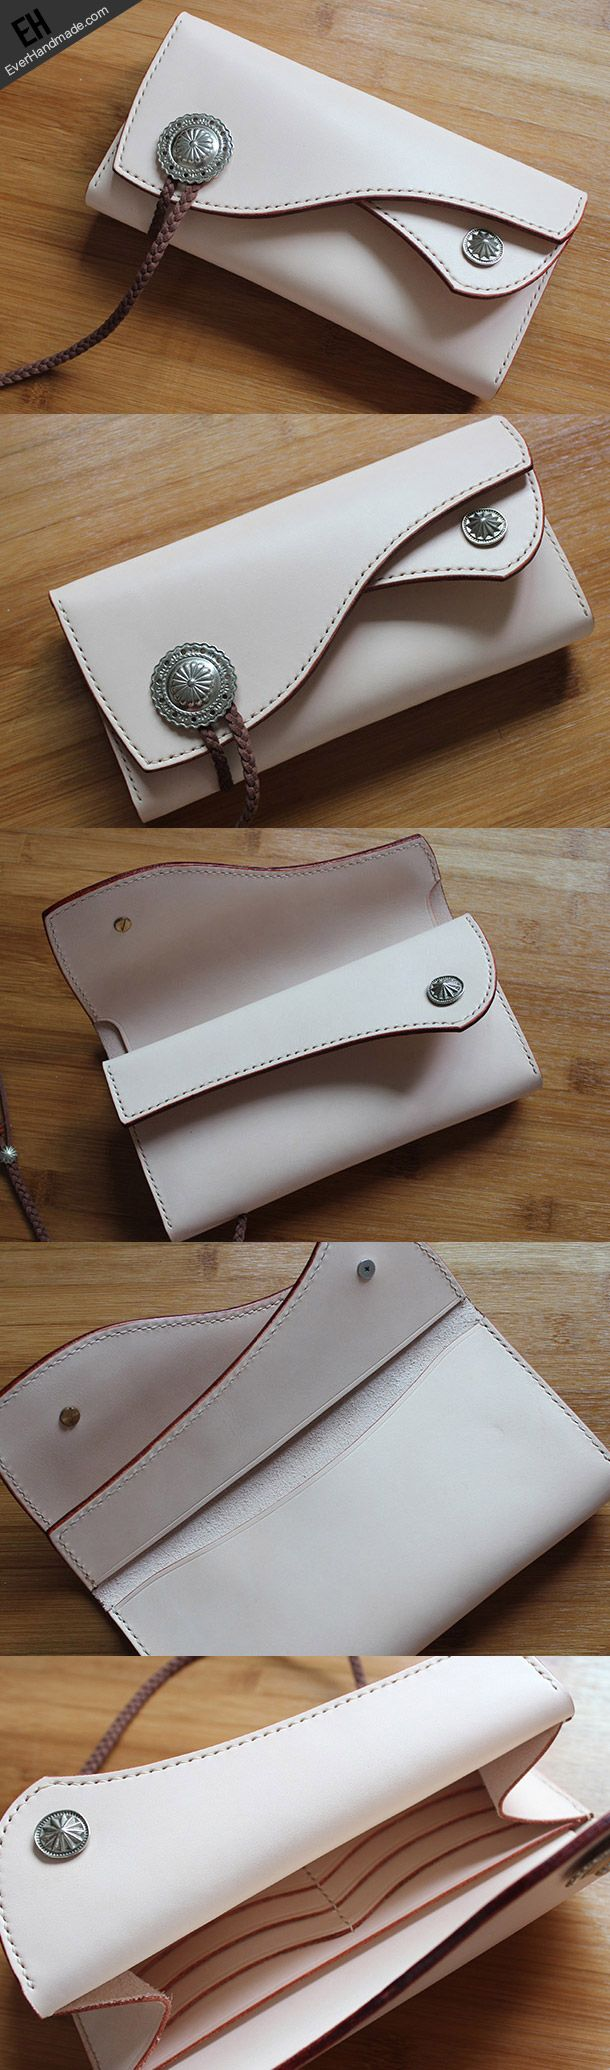 Handmade custom vintage purses leather wallets long phones wallets blue women